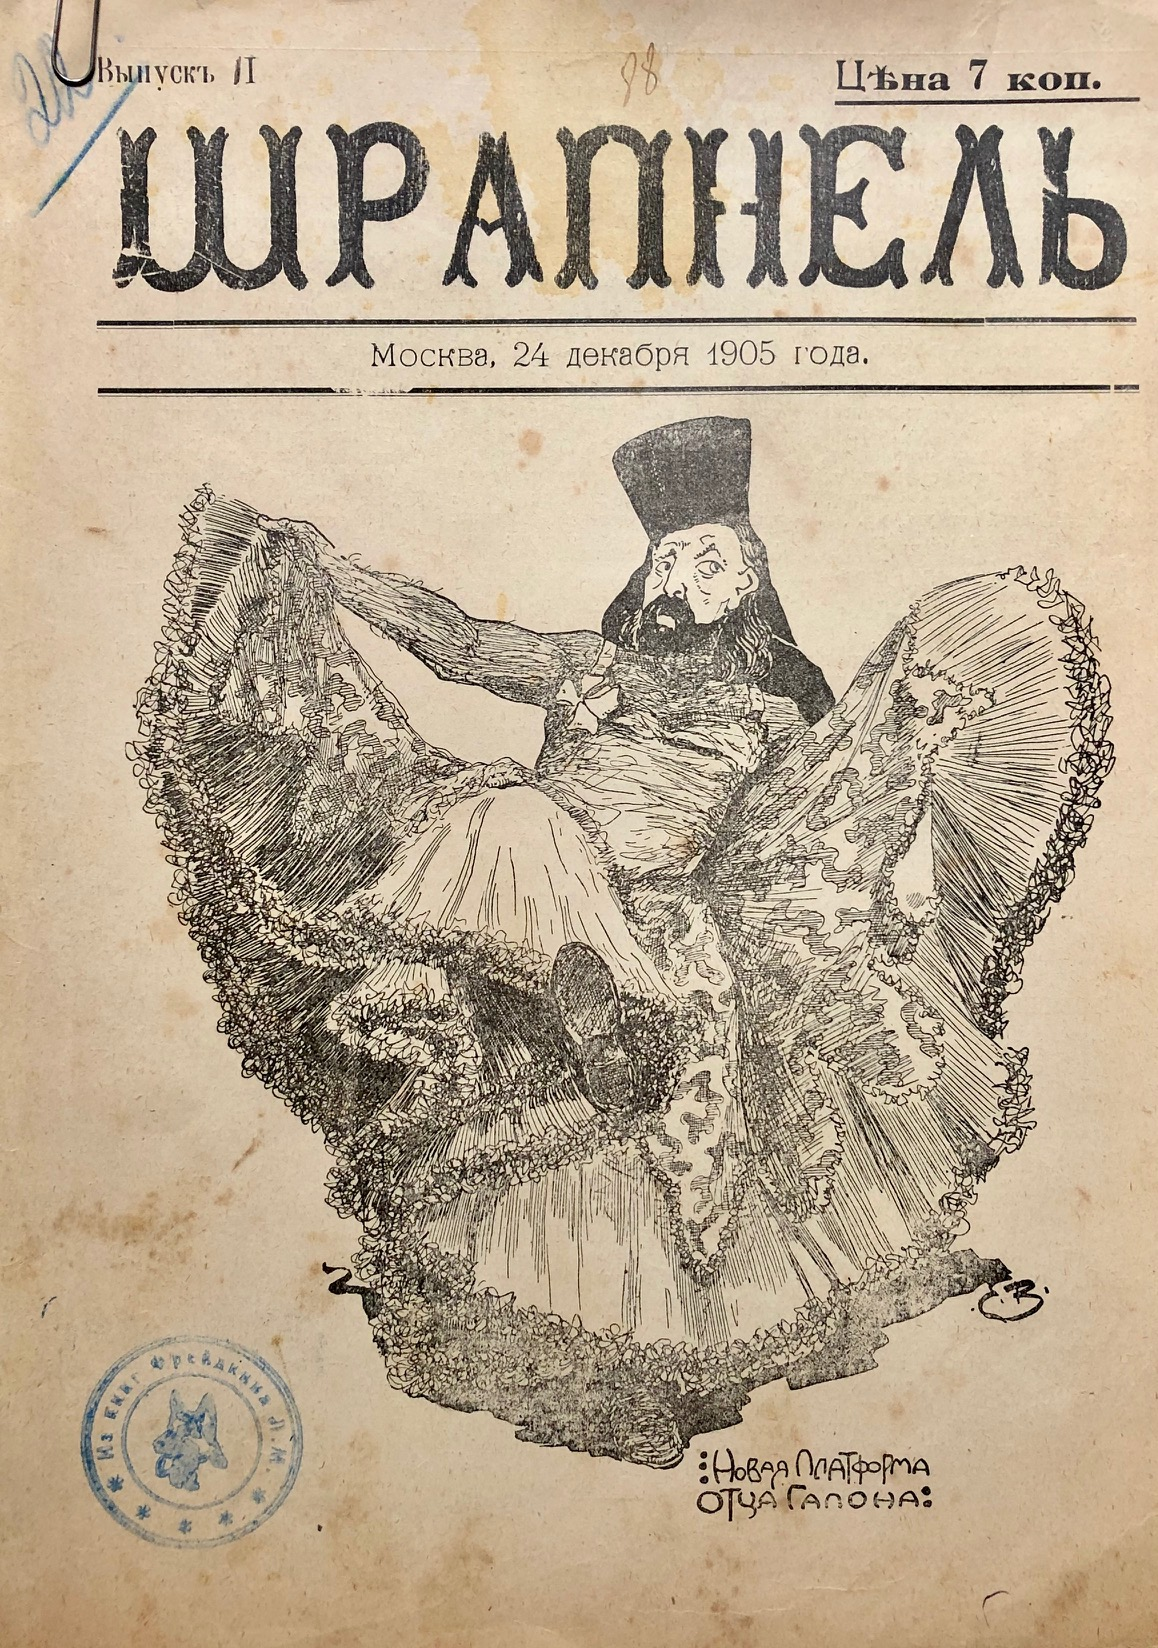 Lot 513 - Le shrapnell. Шрапнель. 1905 г. №3 1-2. Москва. №1. Тетрадь [...]